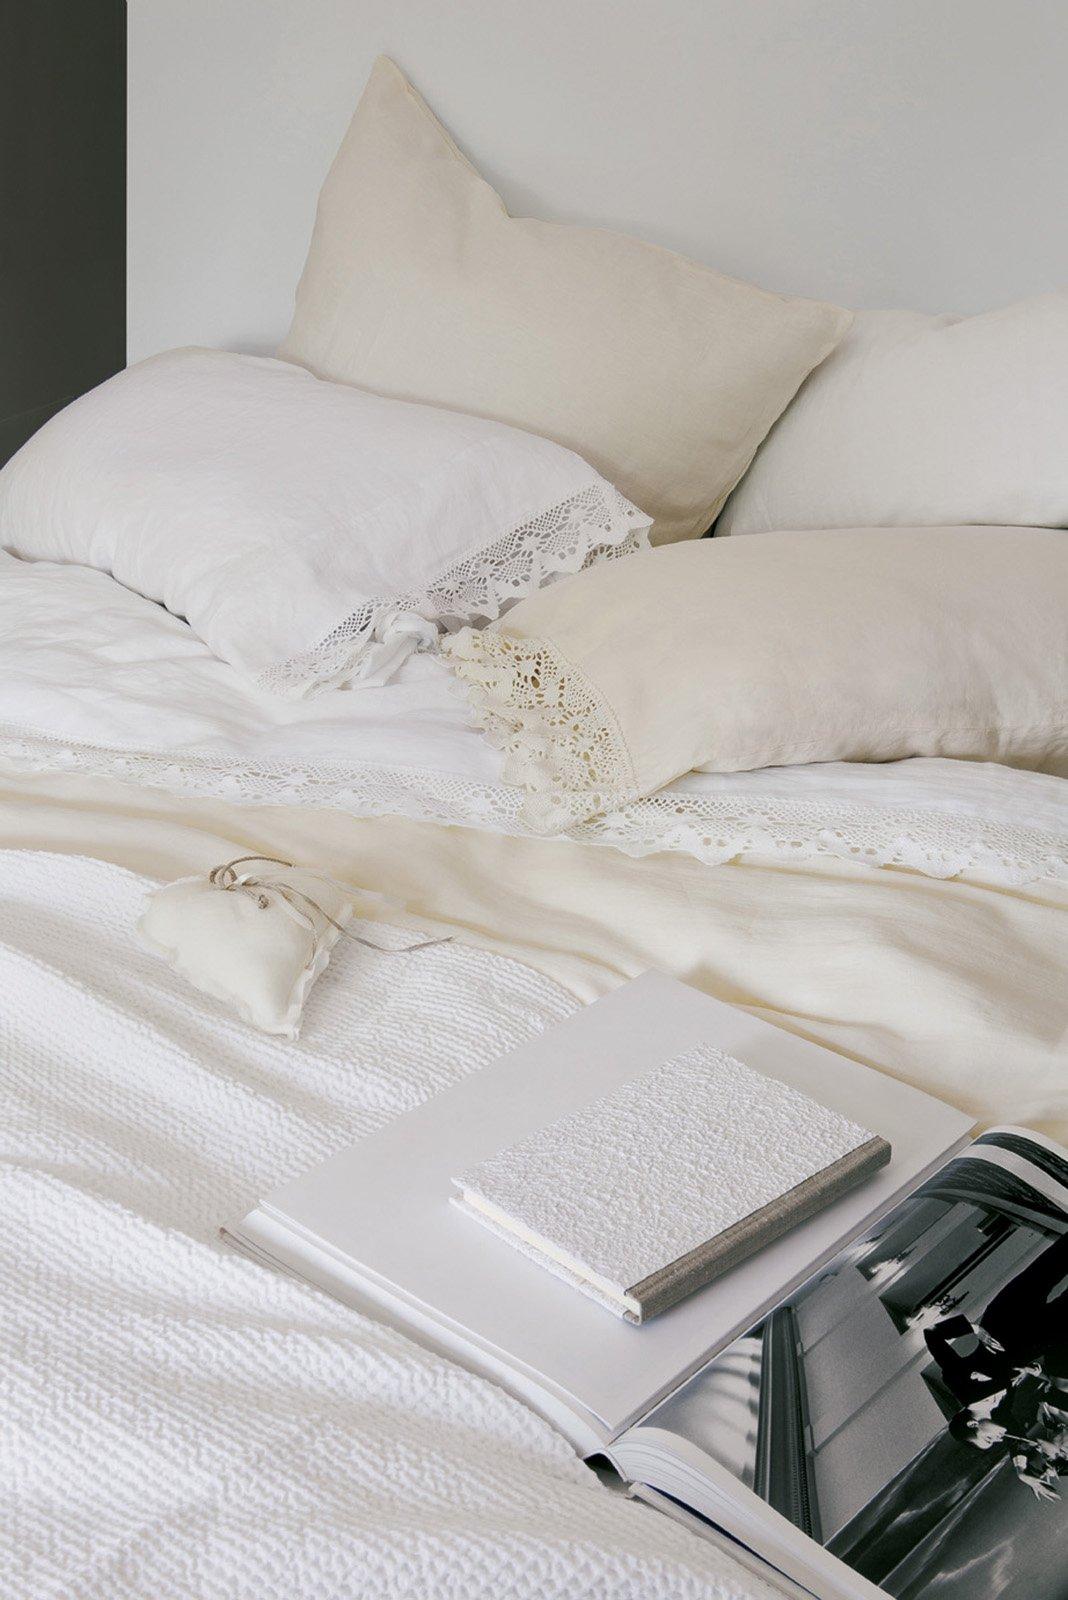 Fazzini blow lenzuola cose di casa for Ikea cuscino nuvola